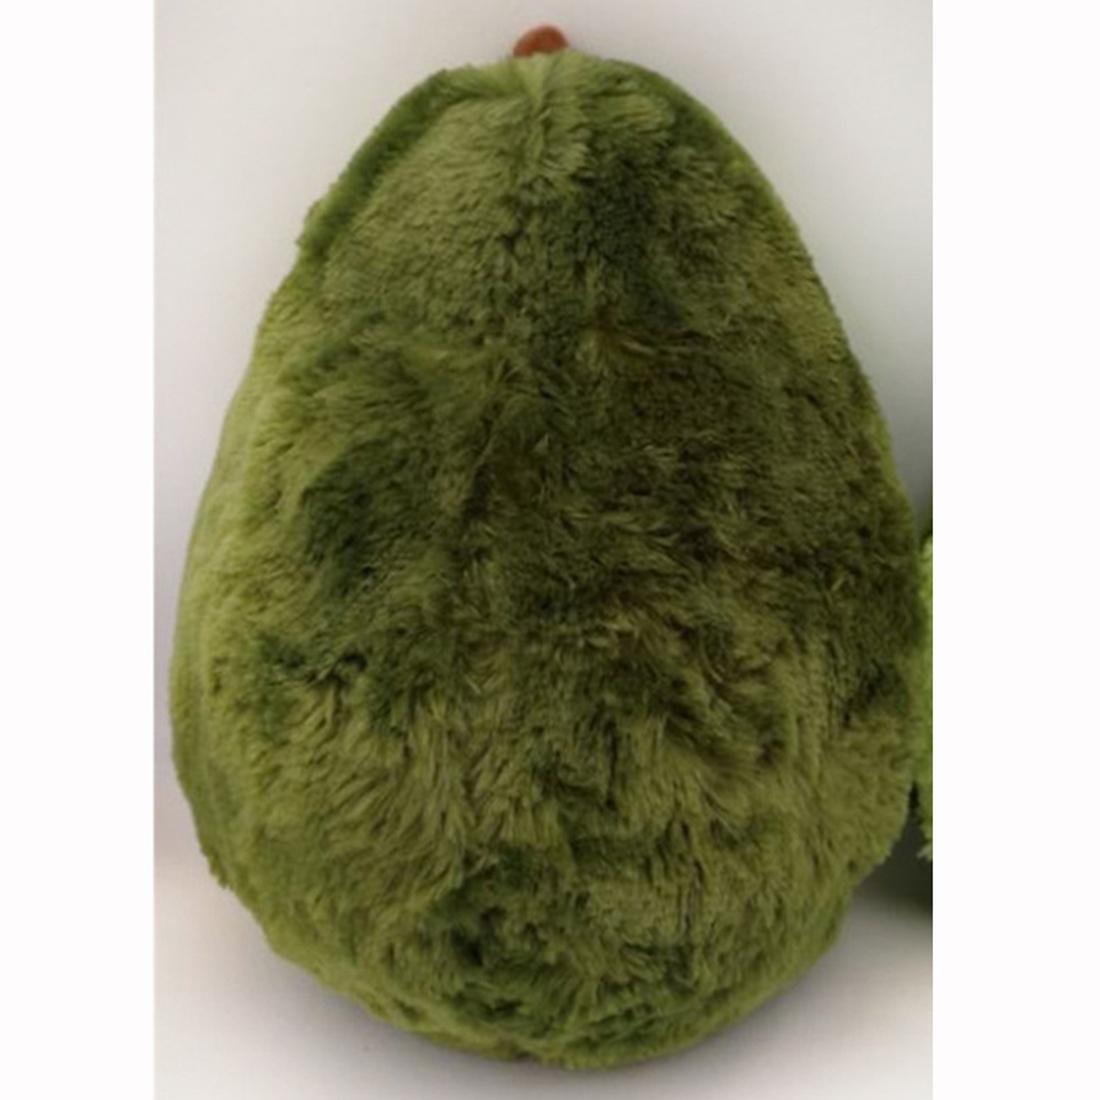 Long Plush Cartoon Avocado Shape Pillow Cushion Plush Toy, Height: 45cm